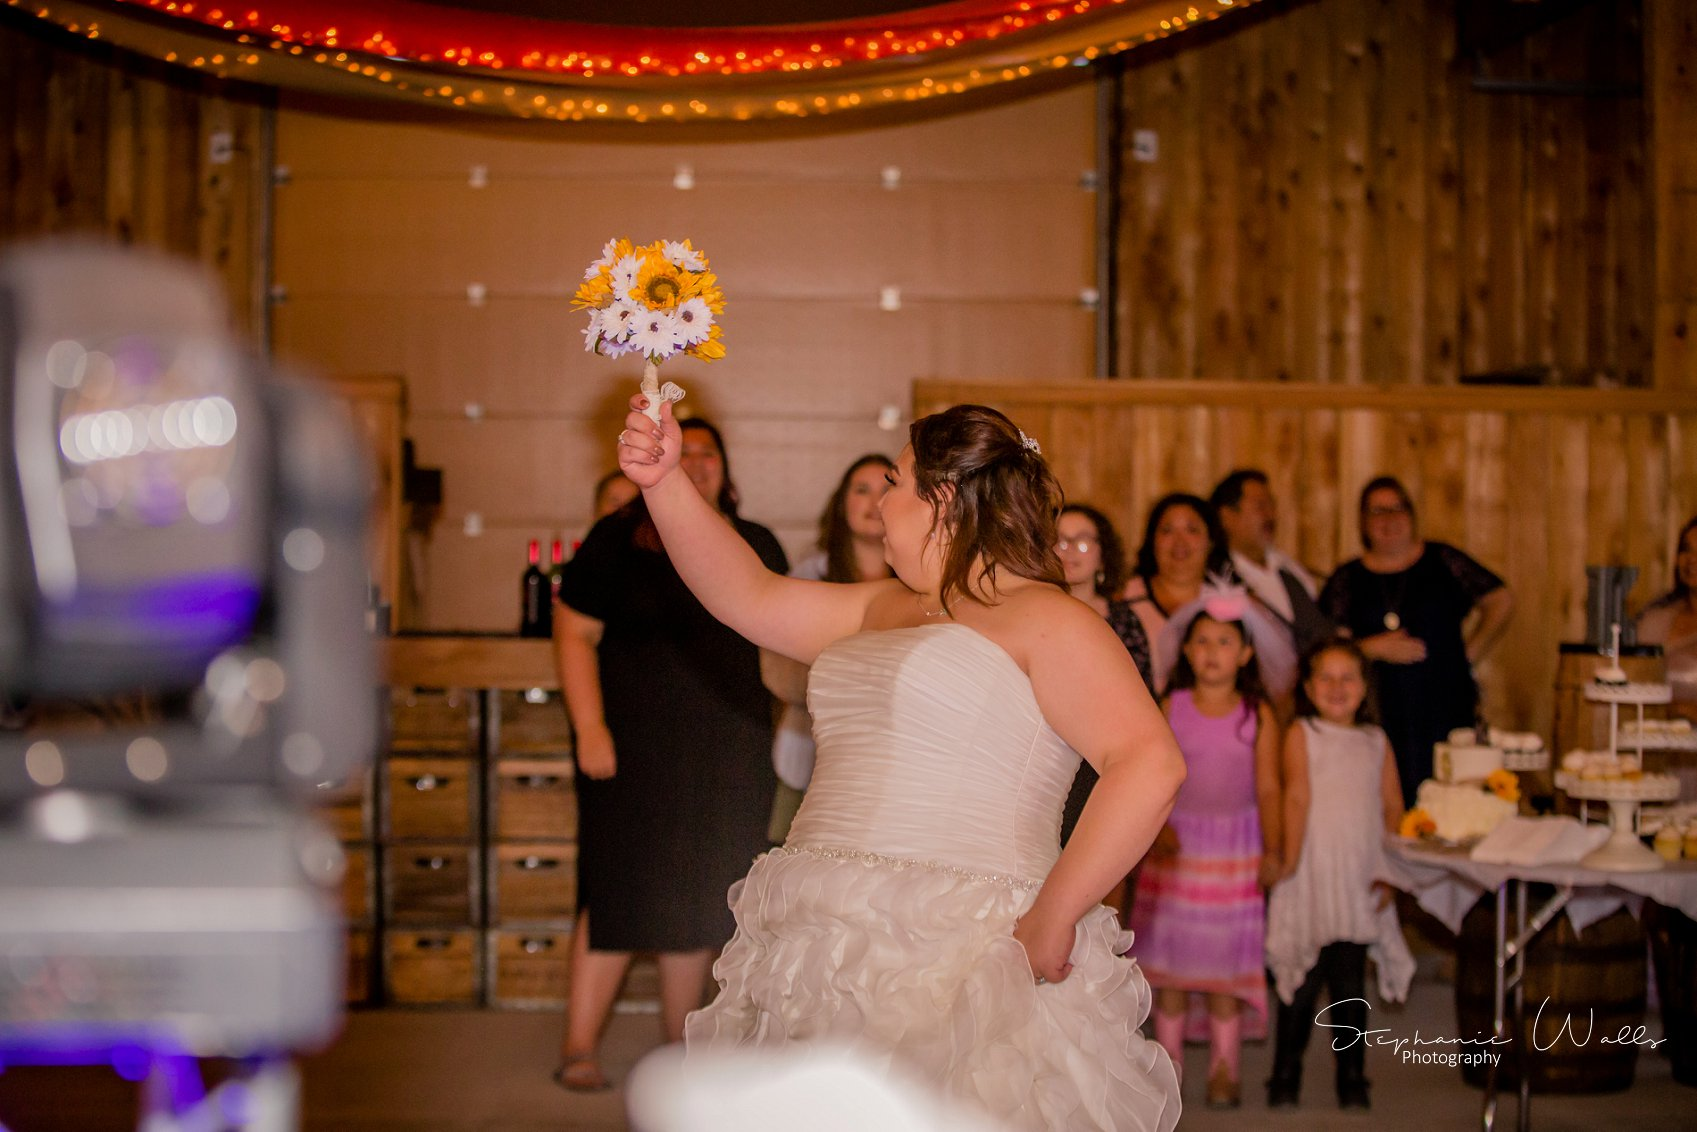 Kimble Wedding 097 Marlena & Allans | Snohomish Red Barn Events (Stocker Farms) | Snohomish, Wa Wedding Photographer